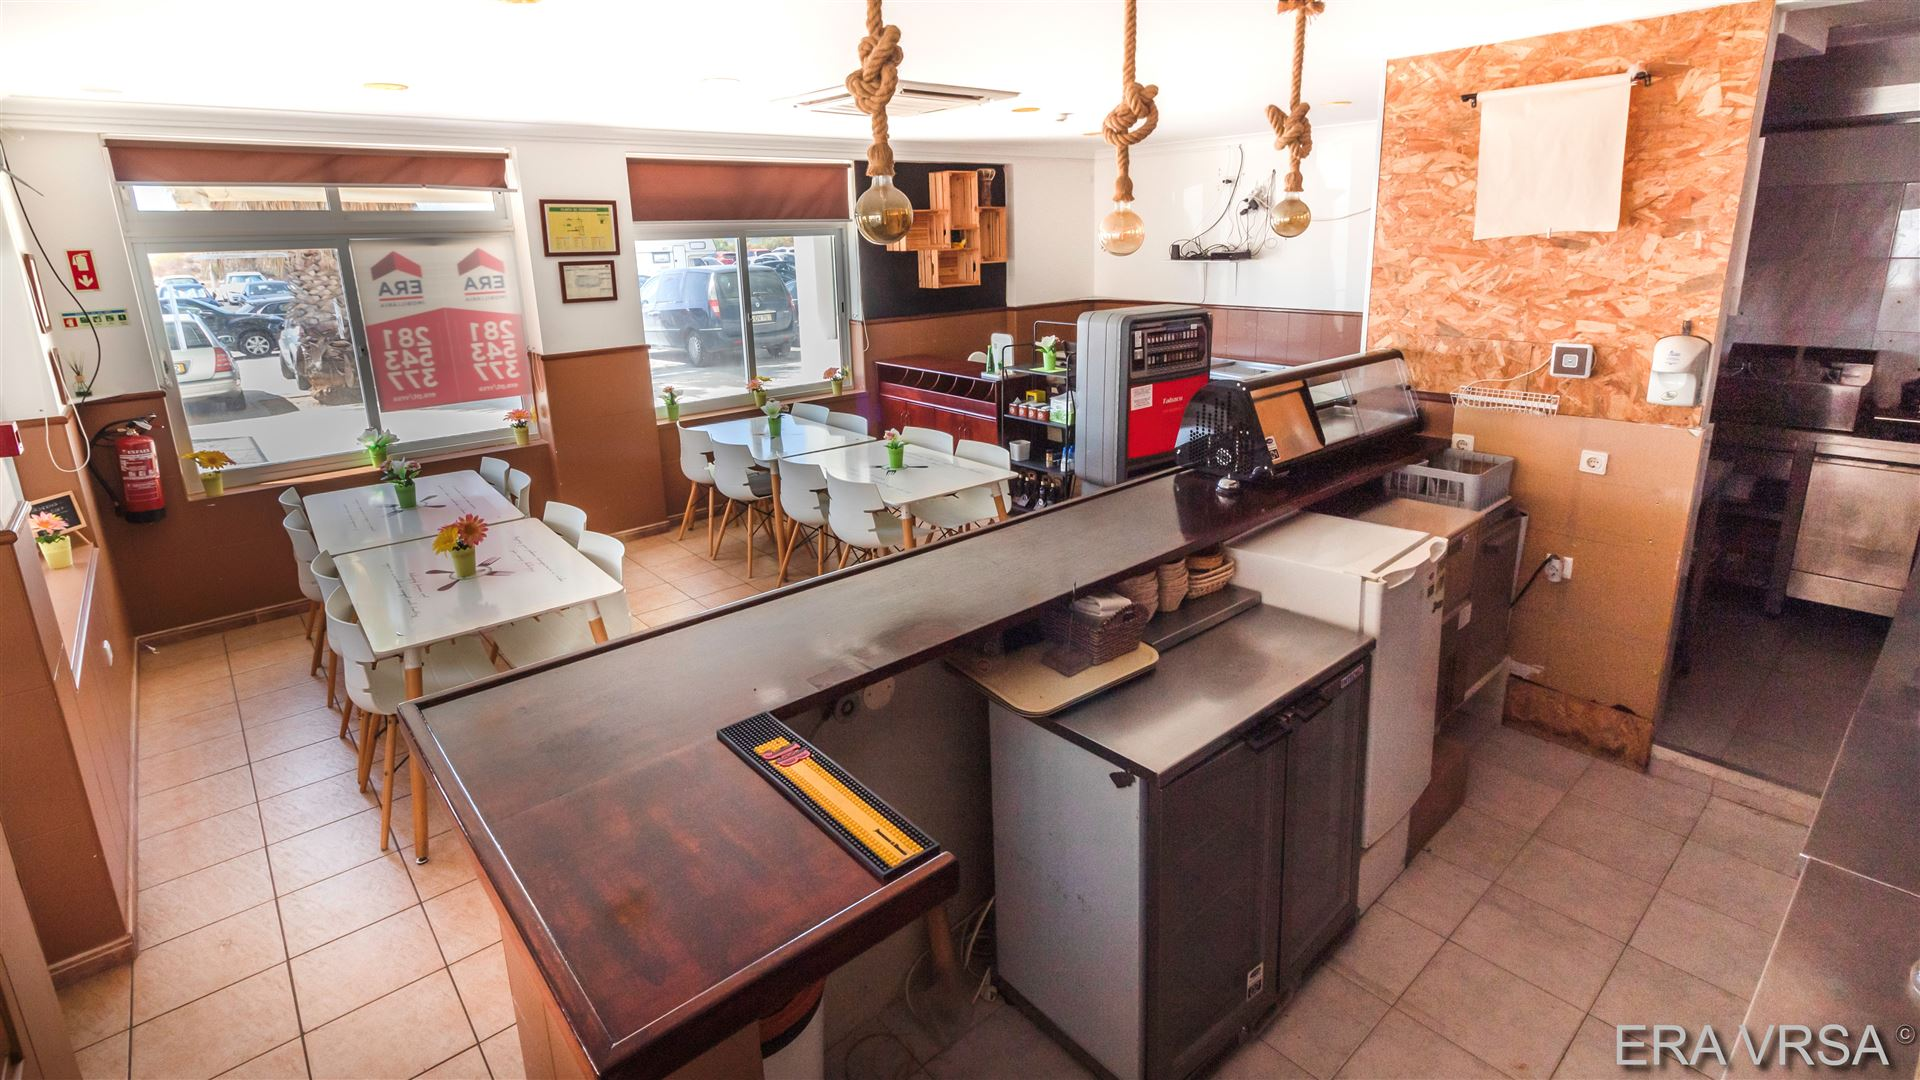 Loja para comprar - Algarve, Monte Gordo, Vila Real de Santo António